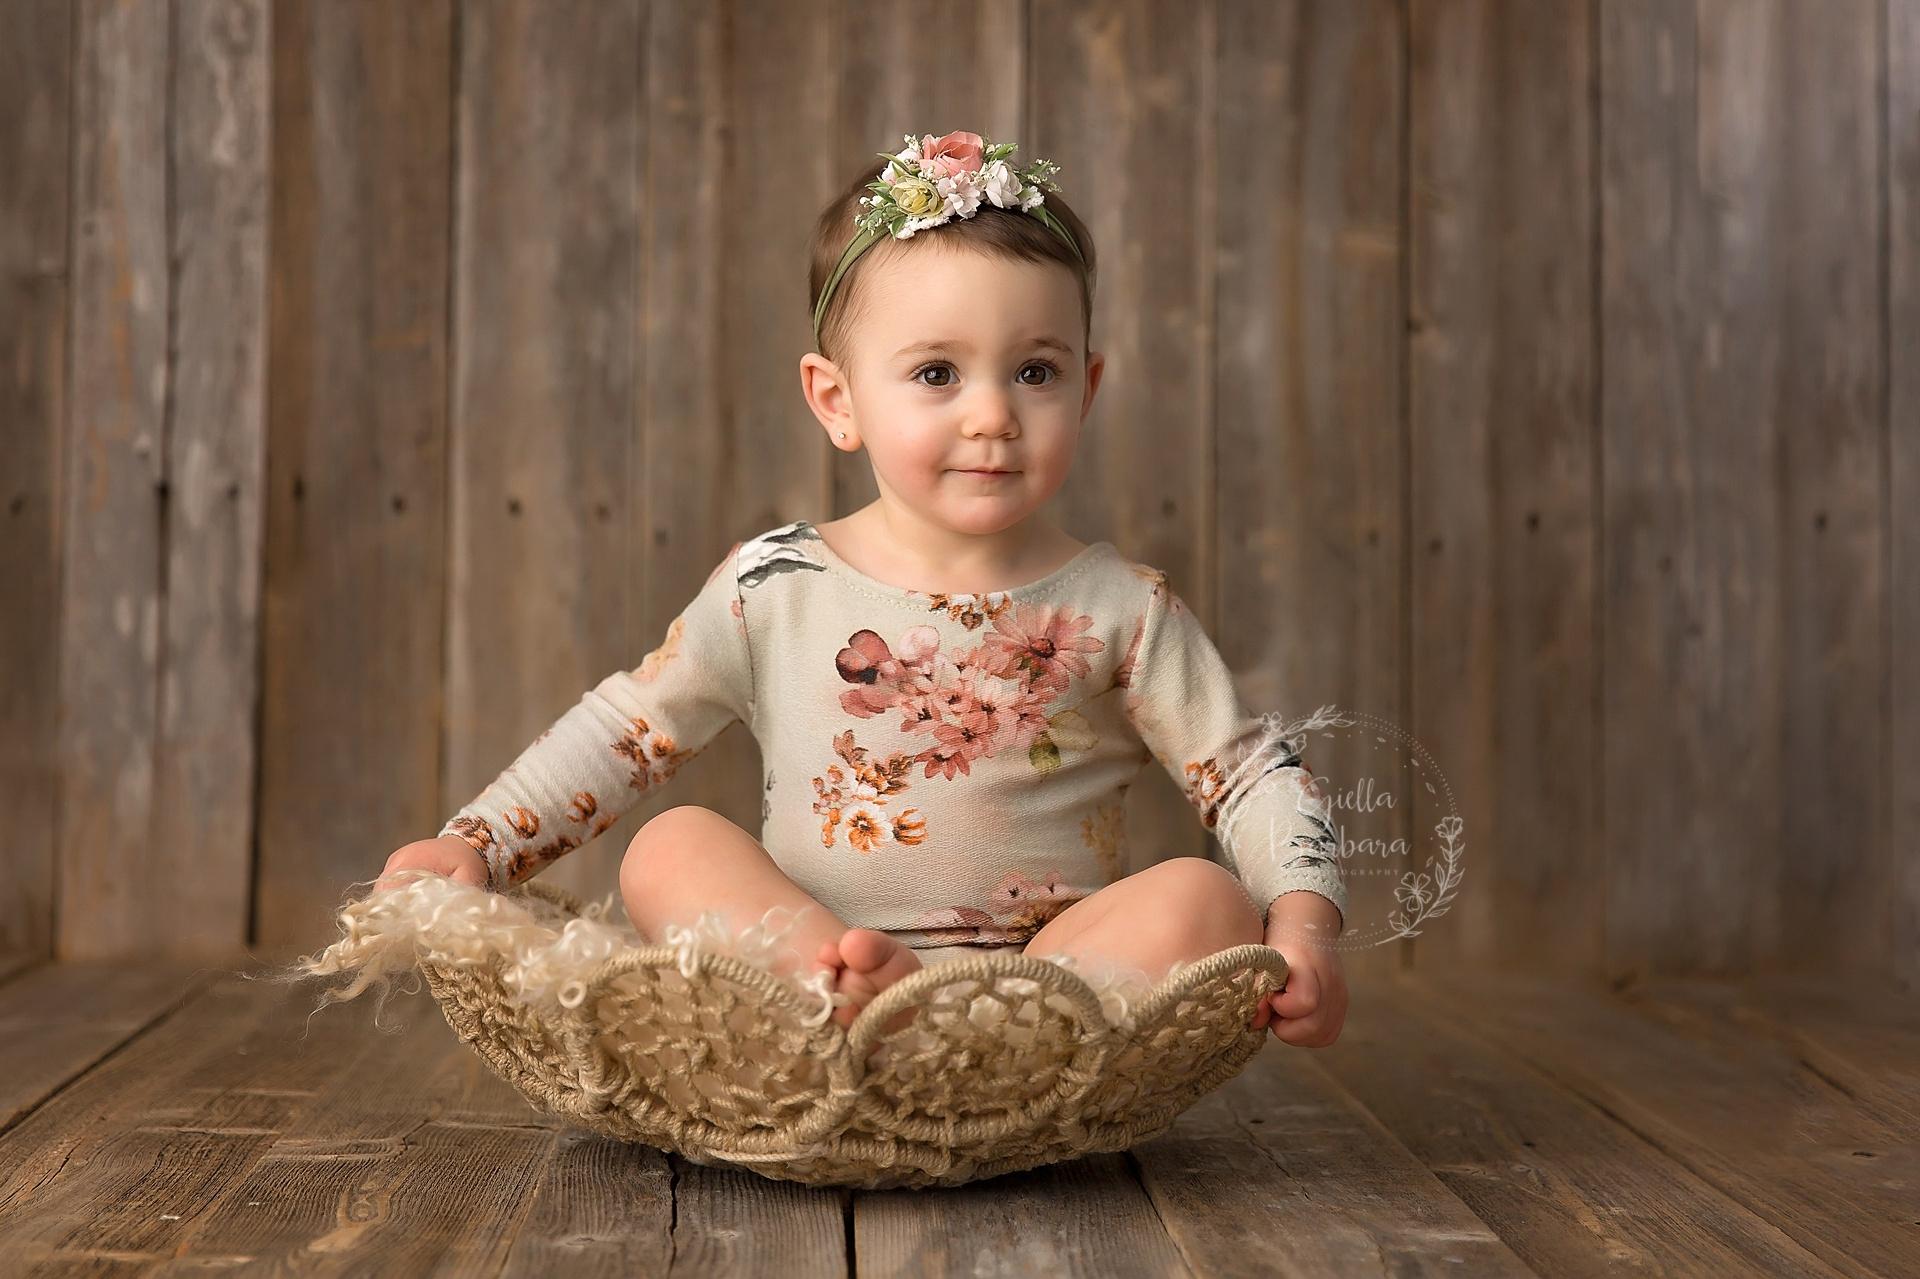 Baby Cake Smash Photography Session